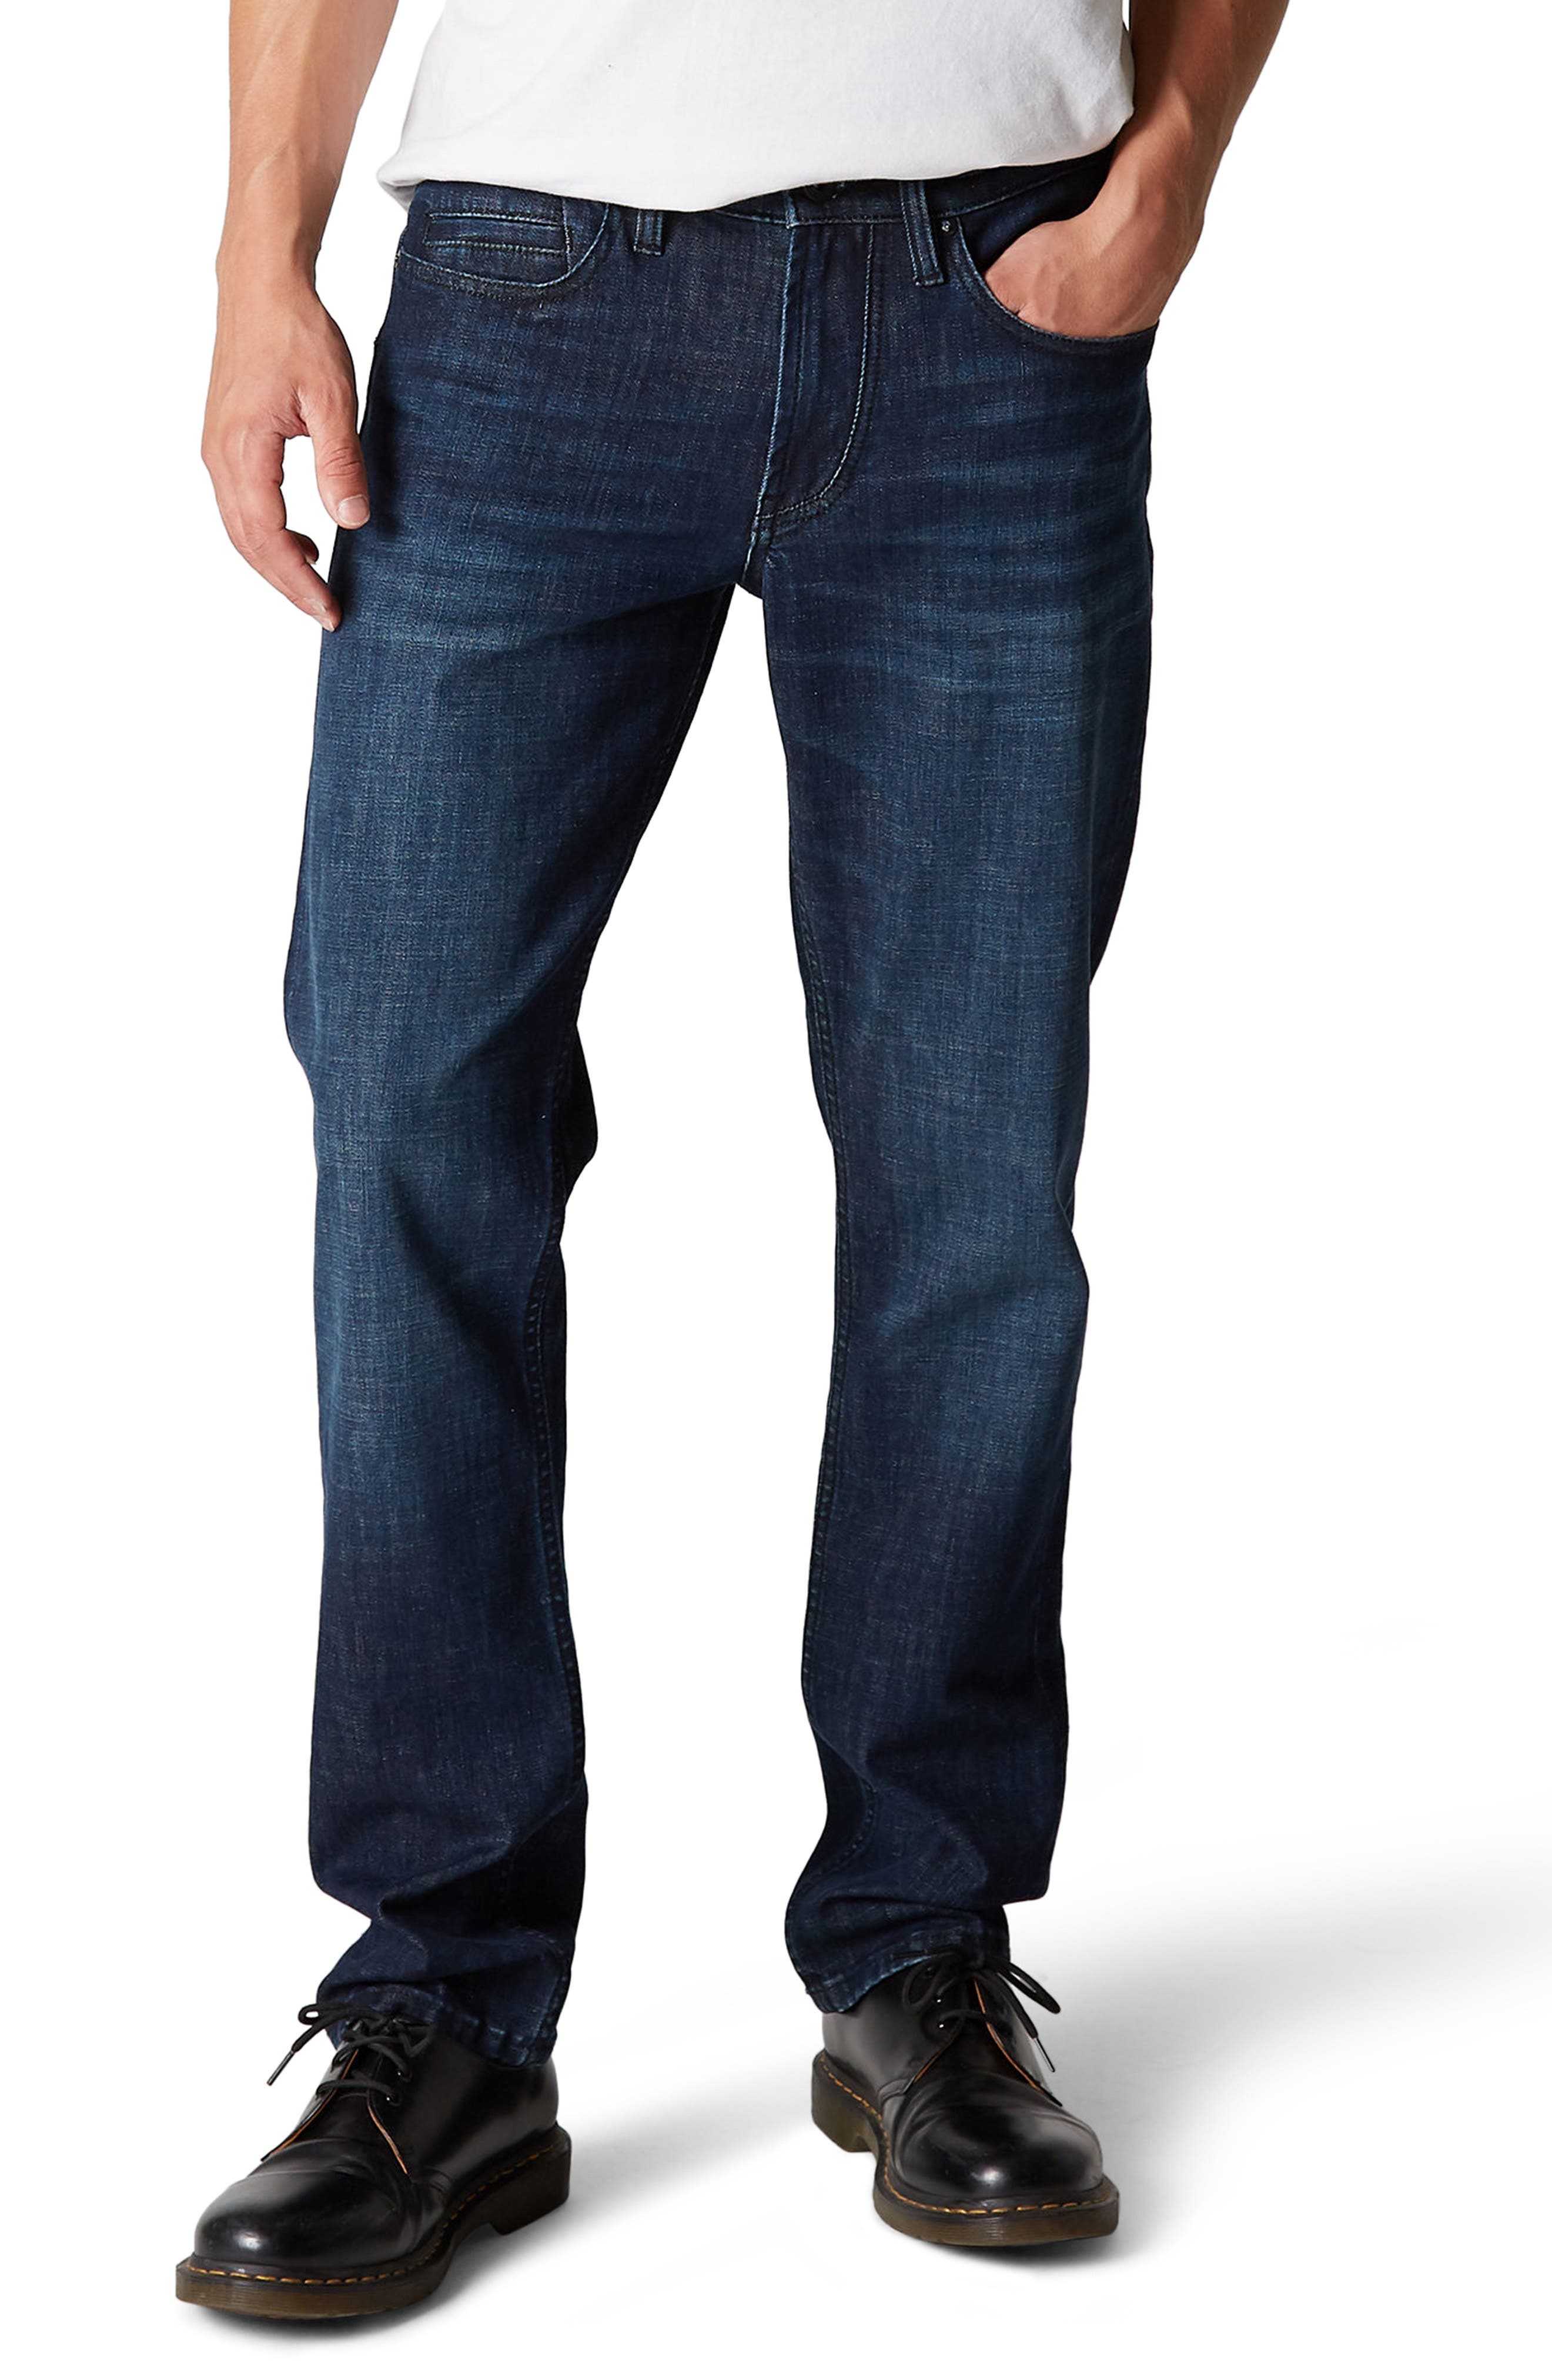 Wooster Slim Fit Jeans,                         Main,                         color, Ten Strikes